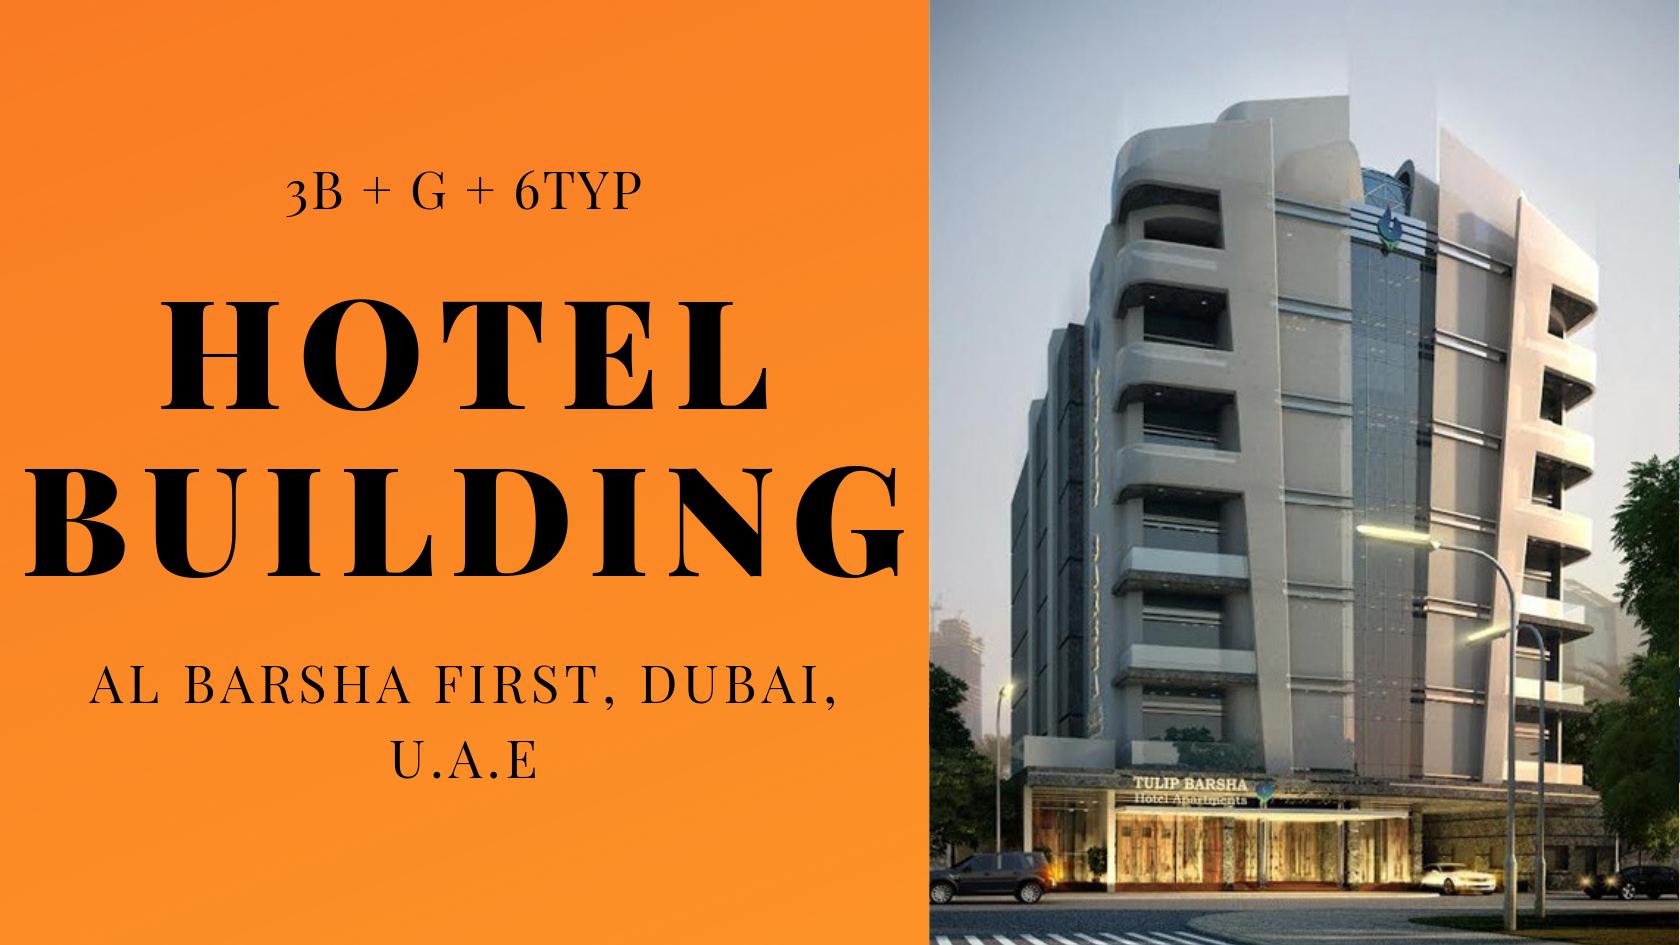 3B+G+6TYP) Hotel Building , Al Barsha First, Dubai, U A E - Zane